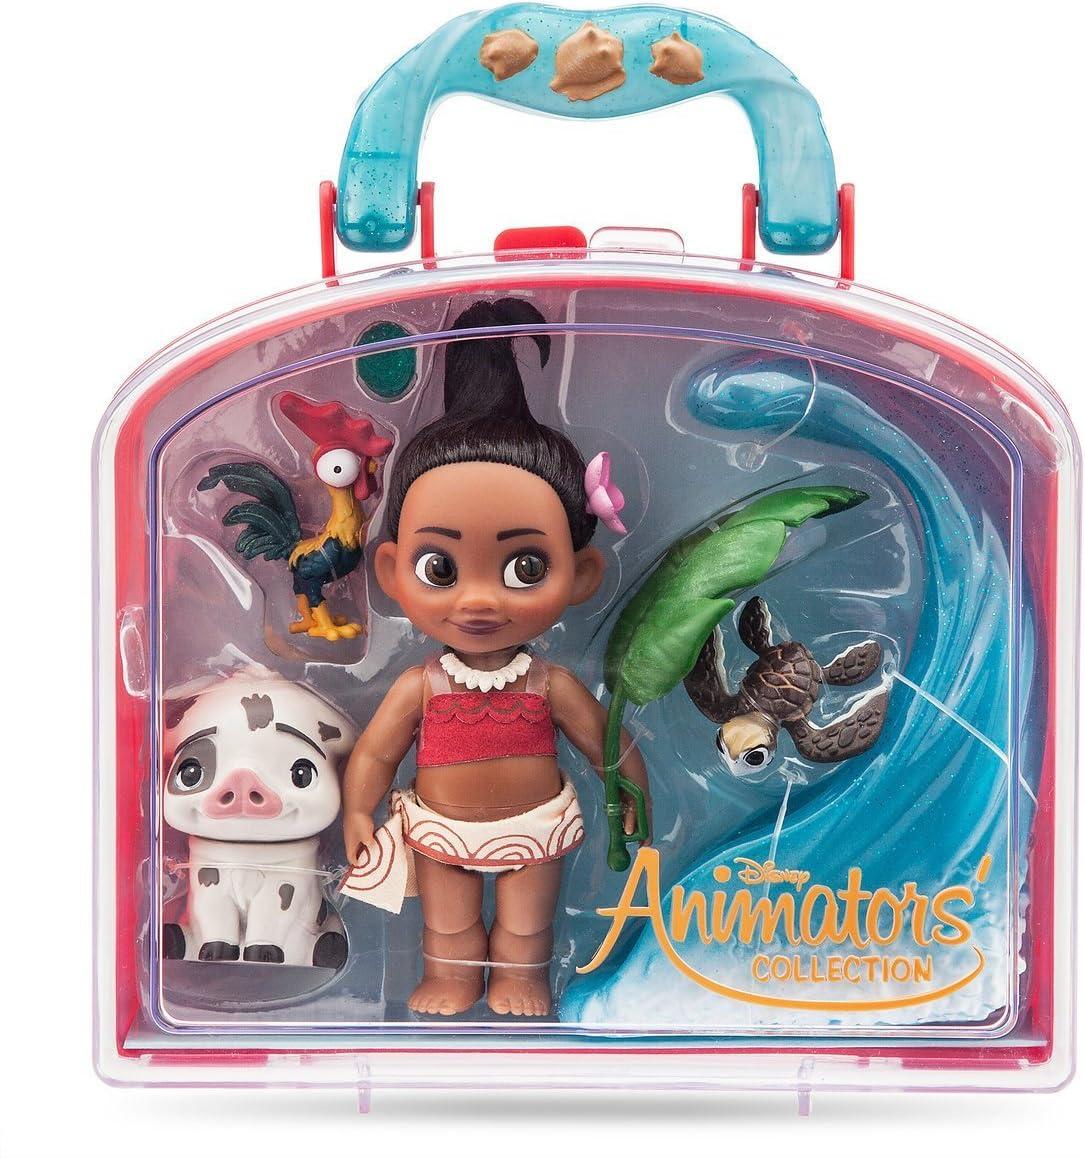 Amazon Com Disney Animators Collection Moana Mini Doll Play Set 5 Inch Toys Games